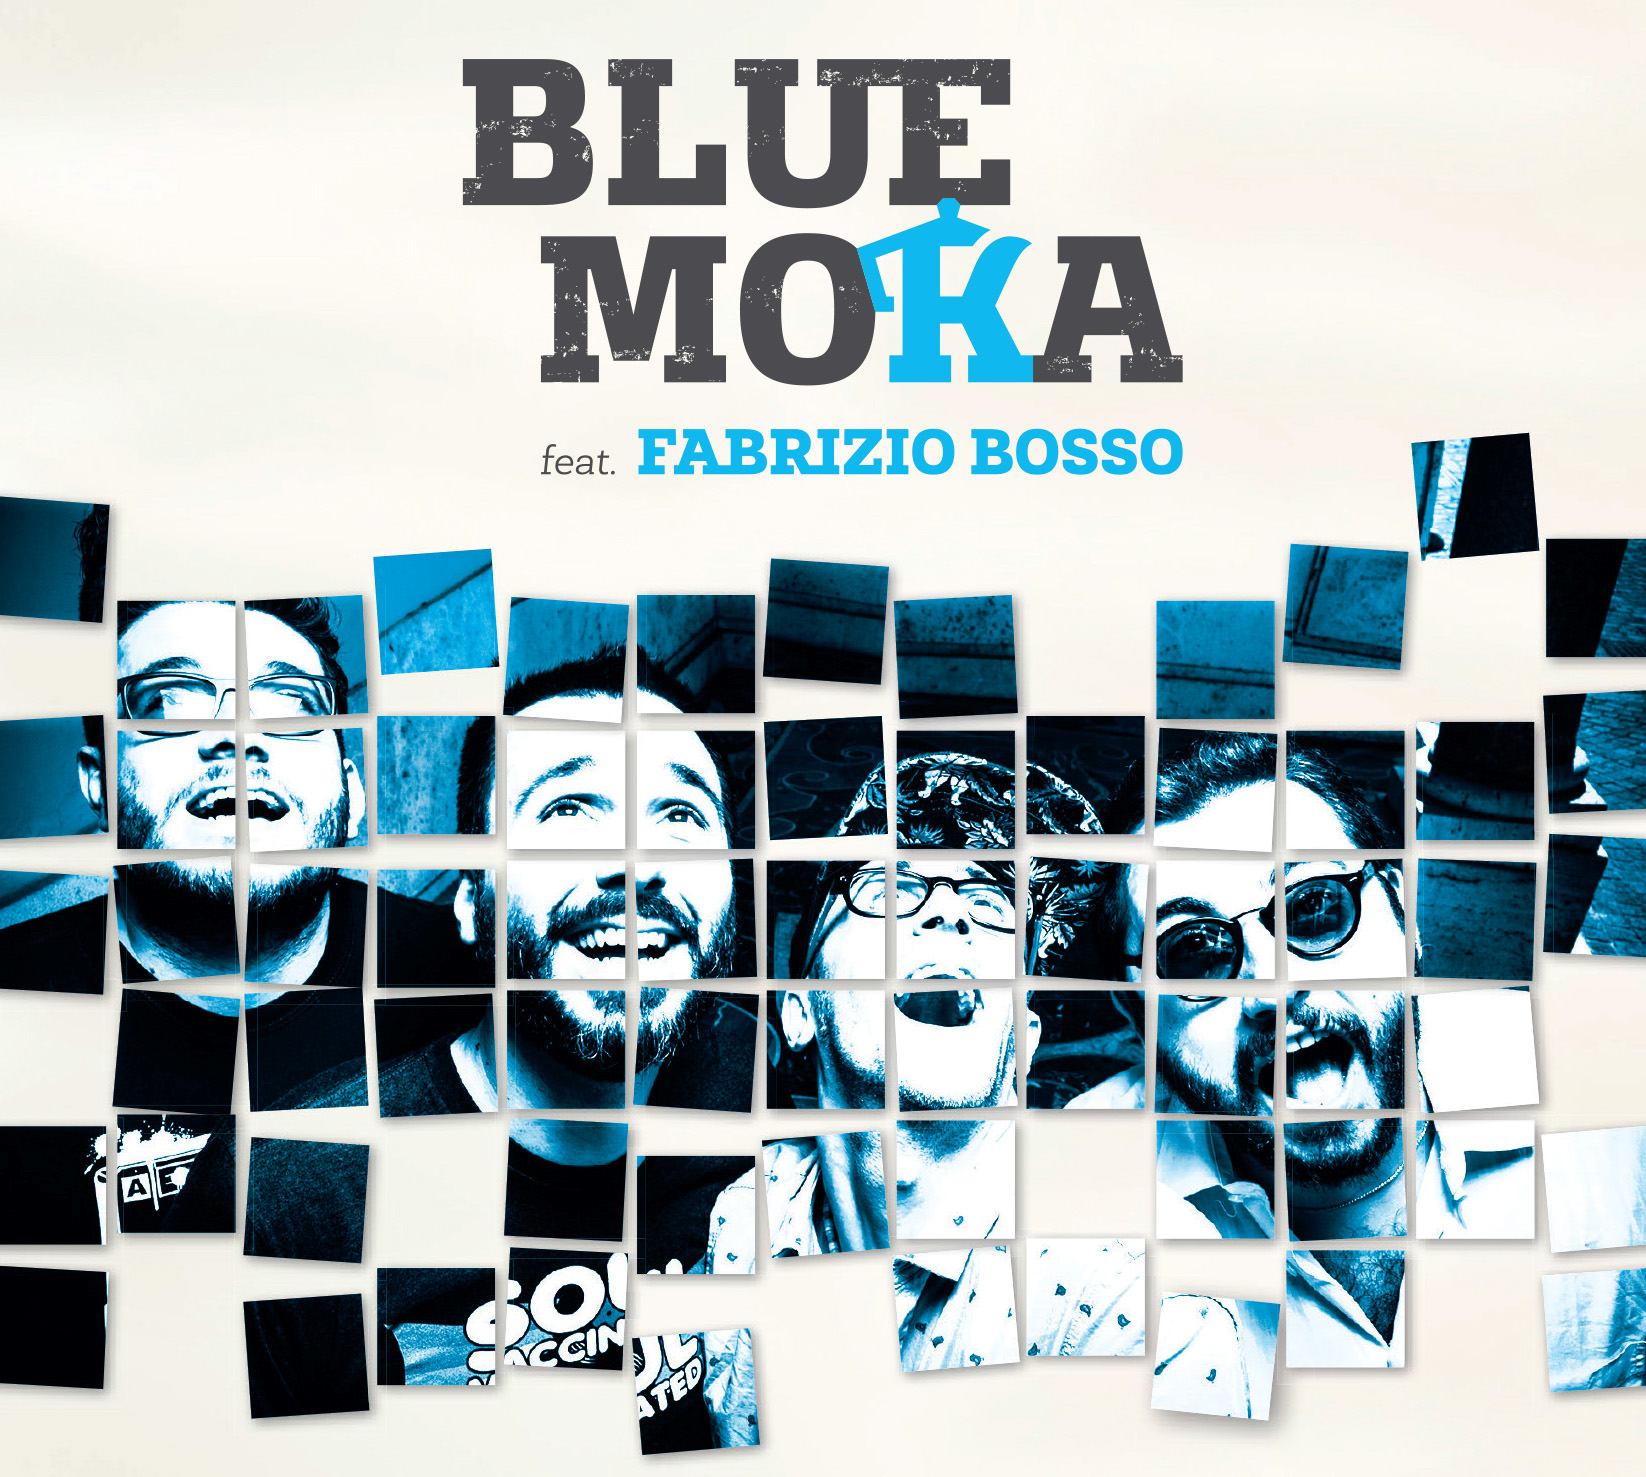 blue moka feat. fabrizio bosso album via veneto jazz jando music